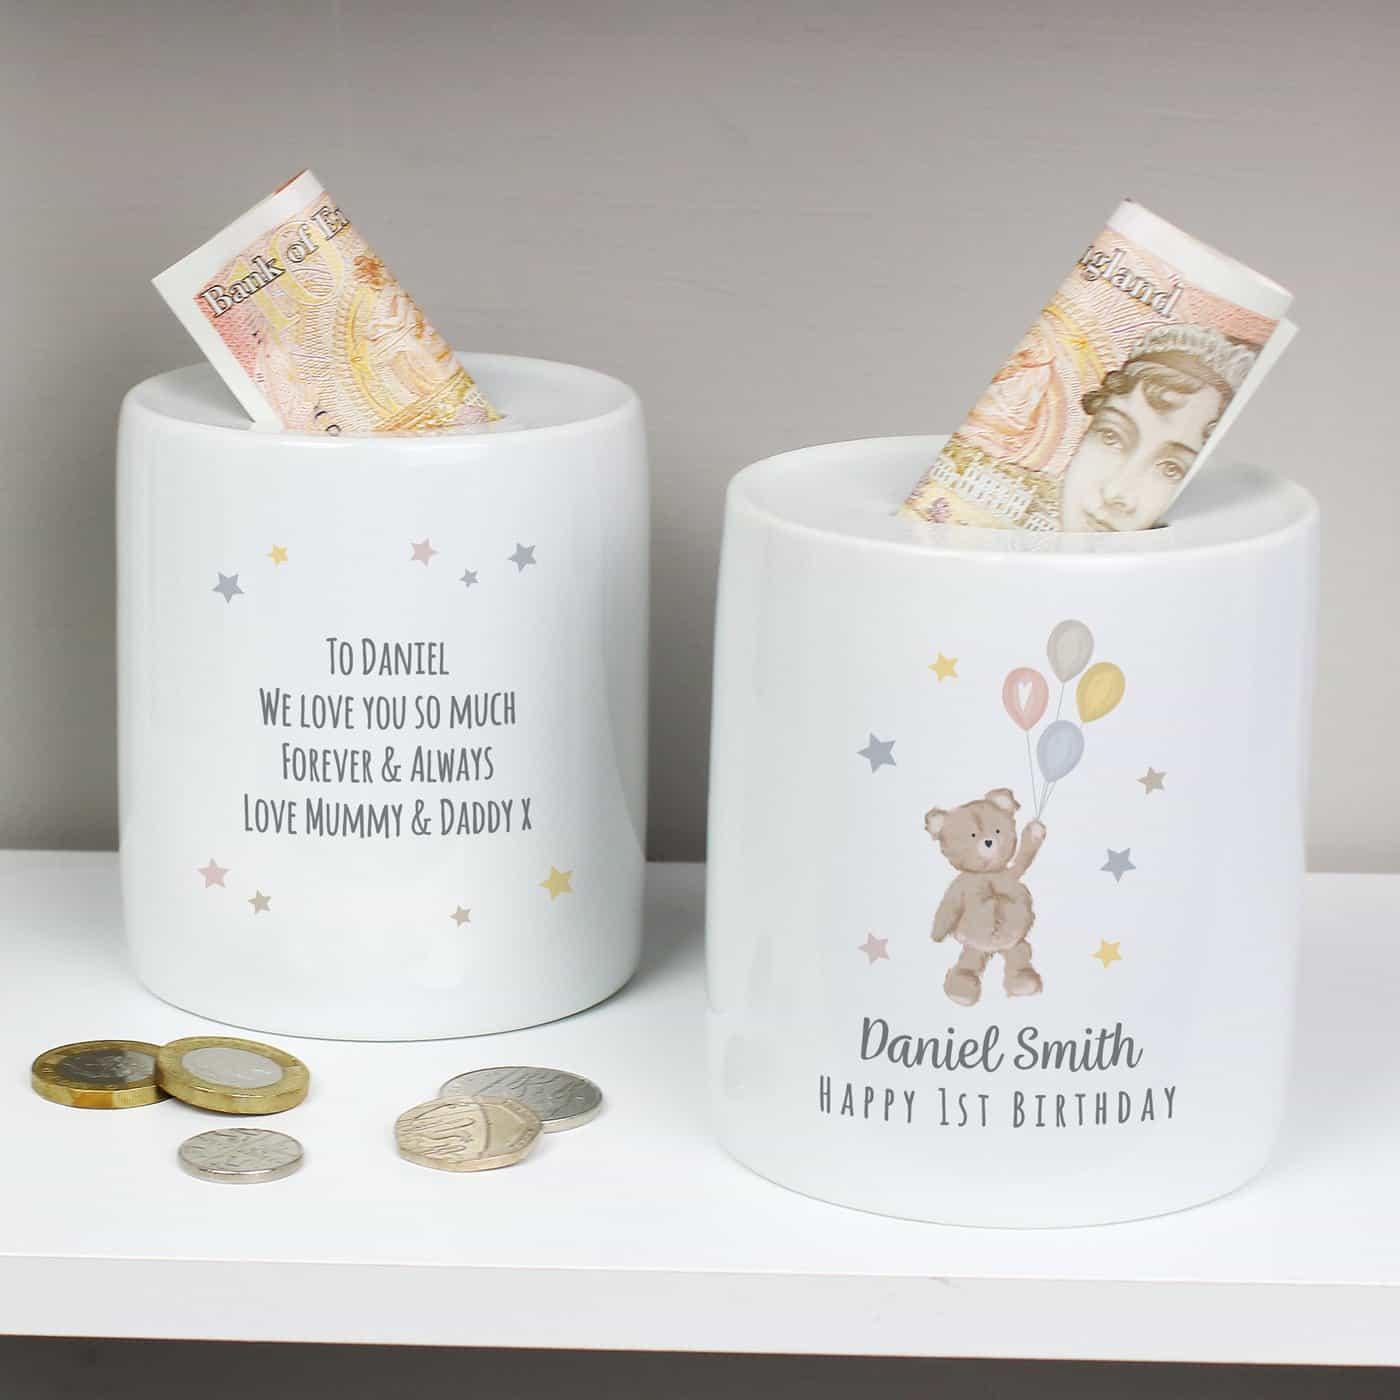 Personalised Teddy & Balloons Money Box